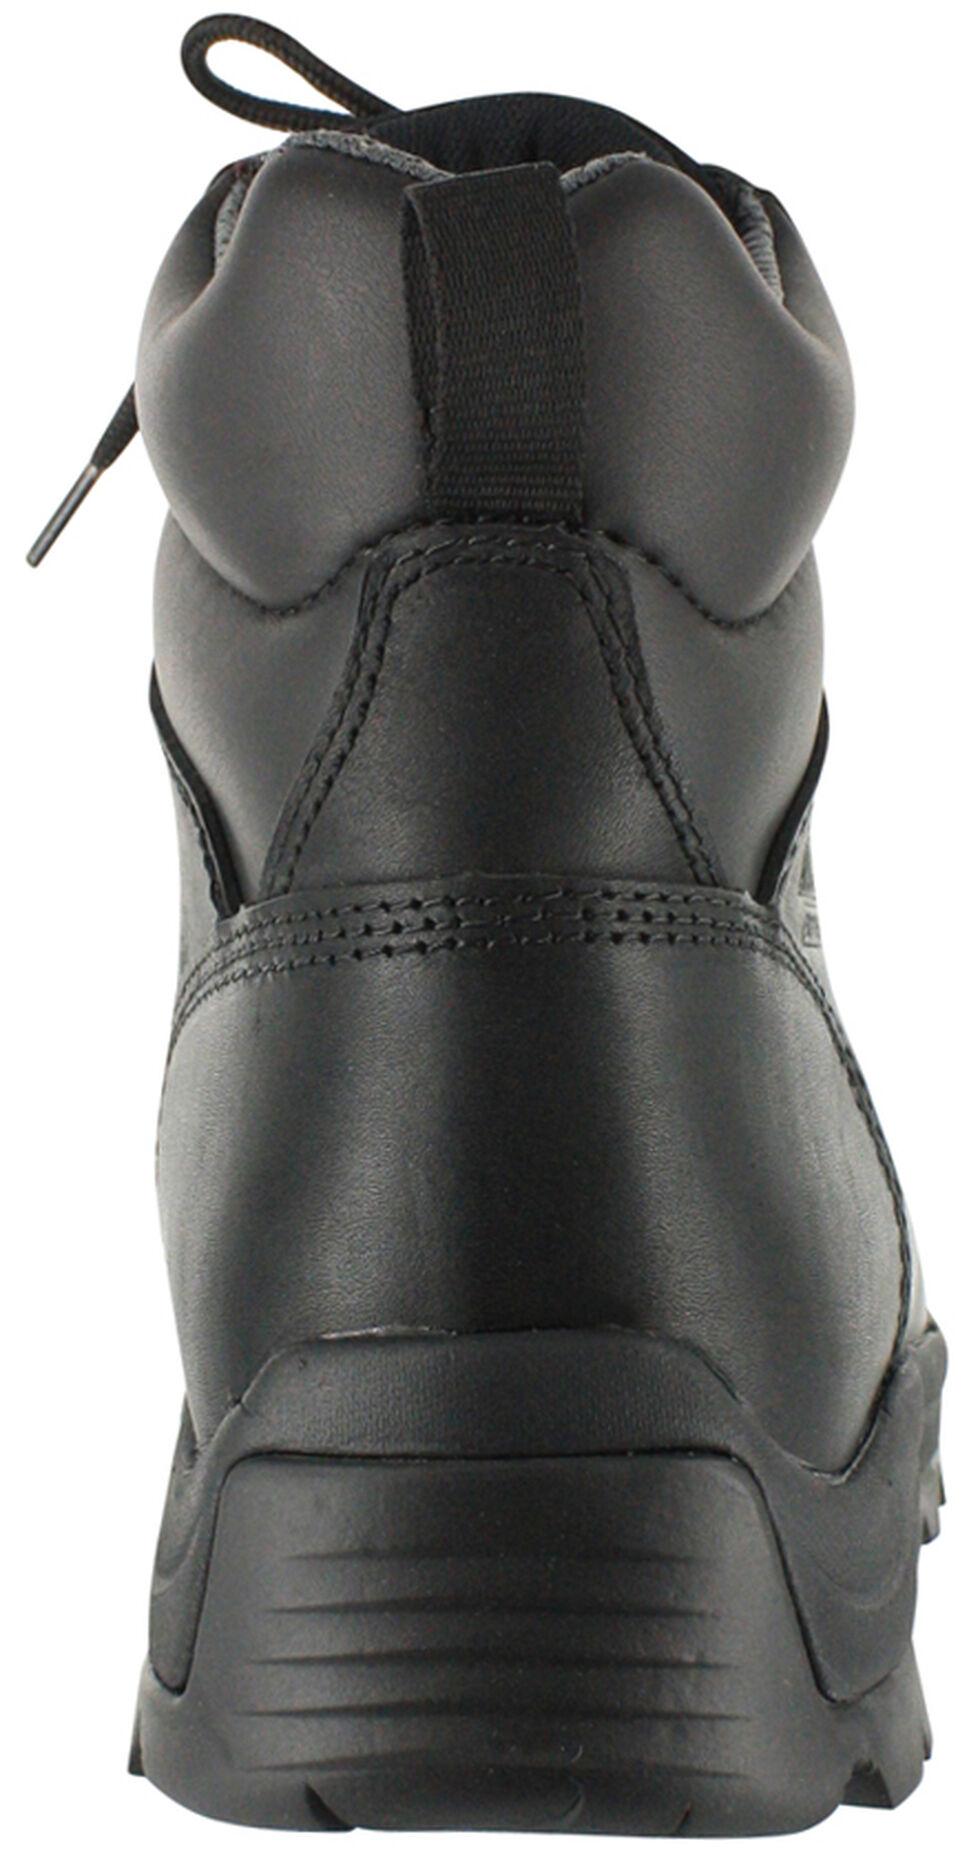 American Worker Men's Stealth Work Boots - Composite Toe, Black, hi-res